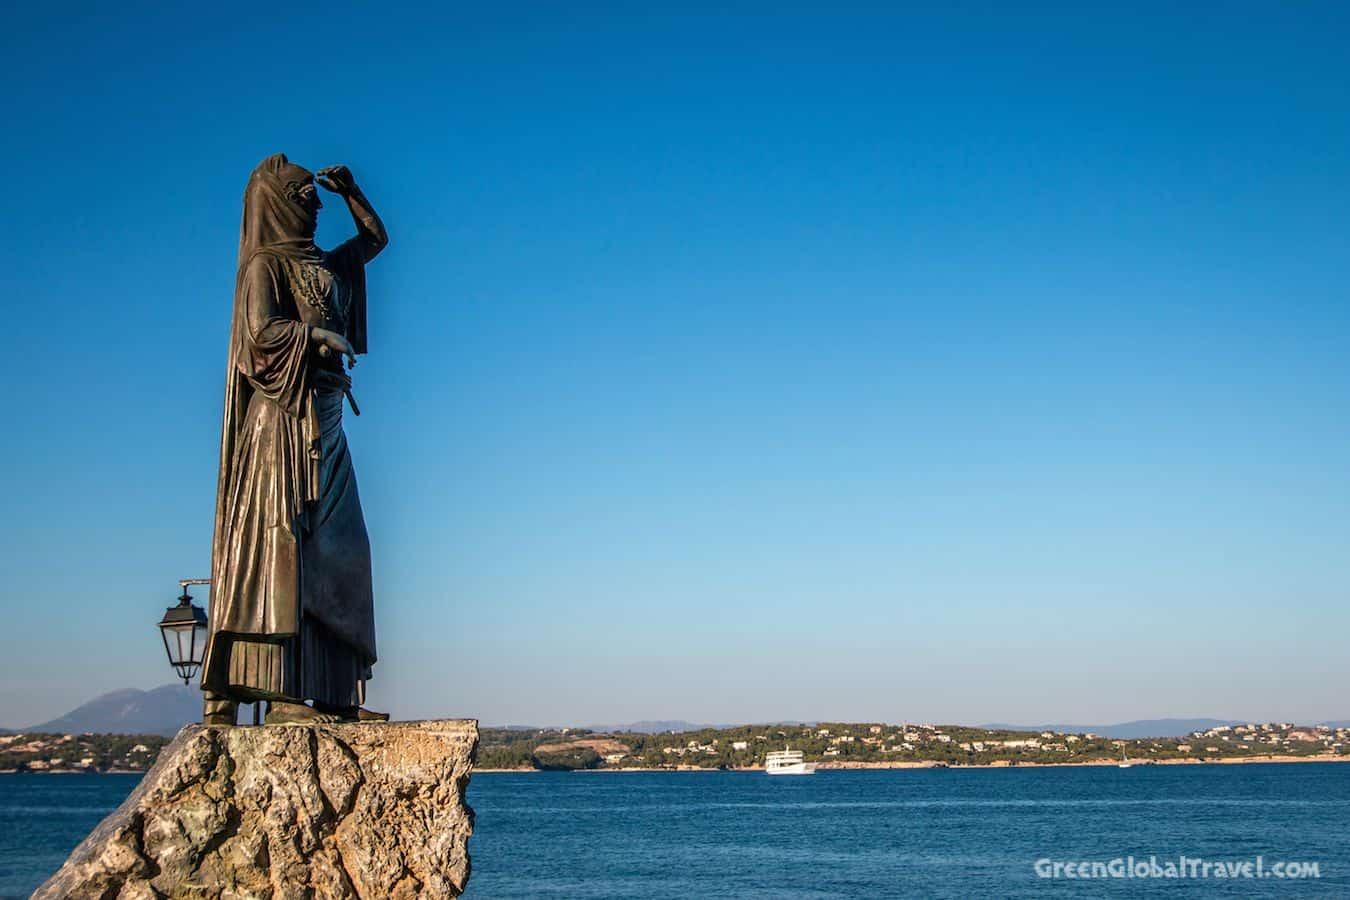 Spetses_Statue_Laskarina_ Bouboulina